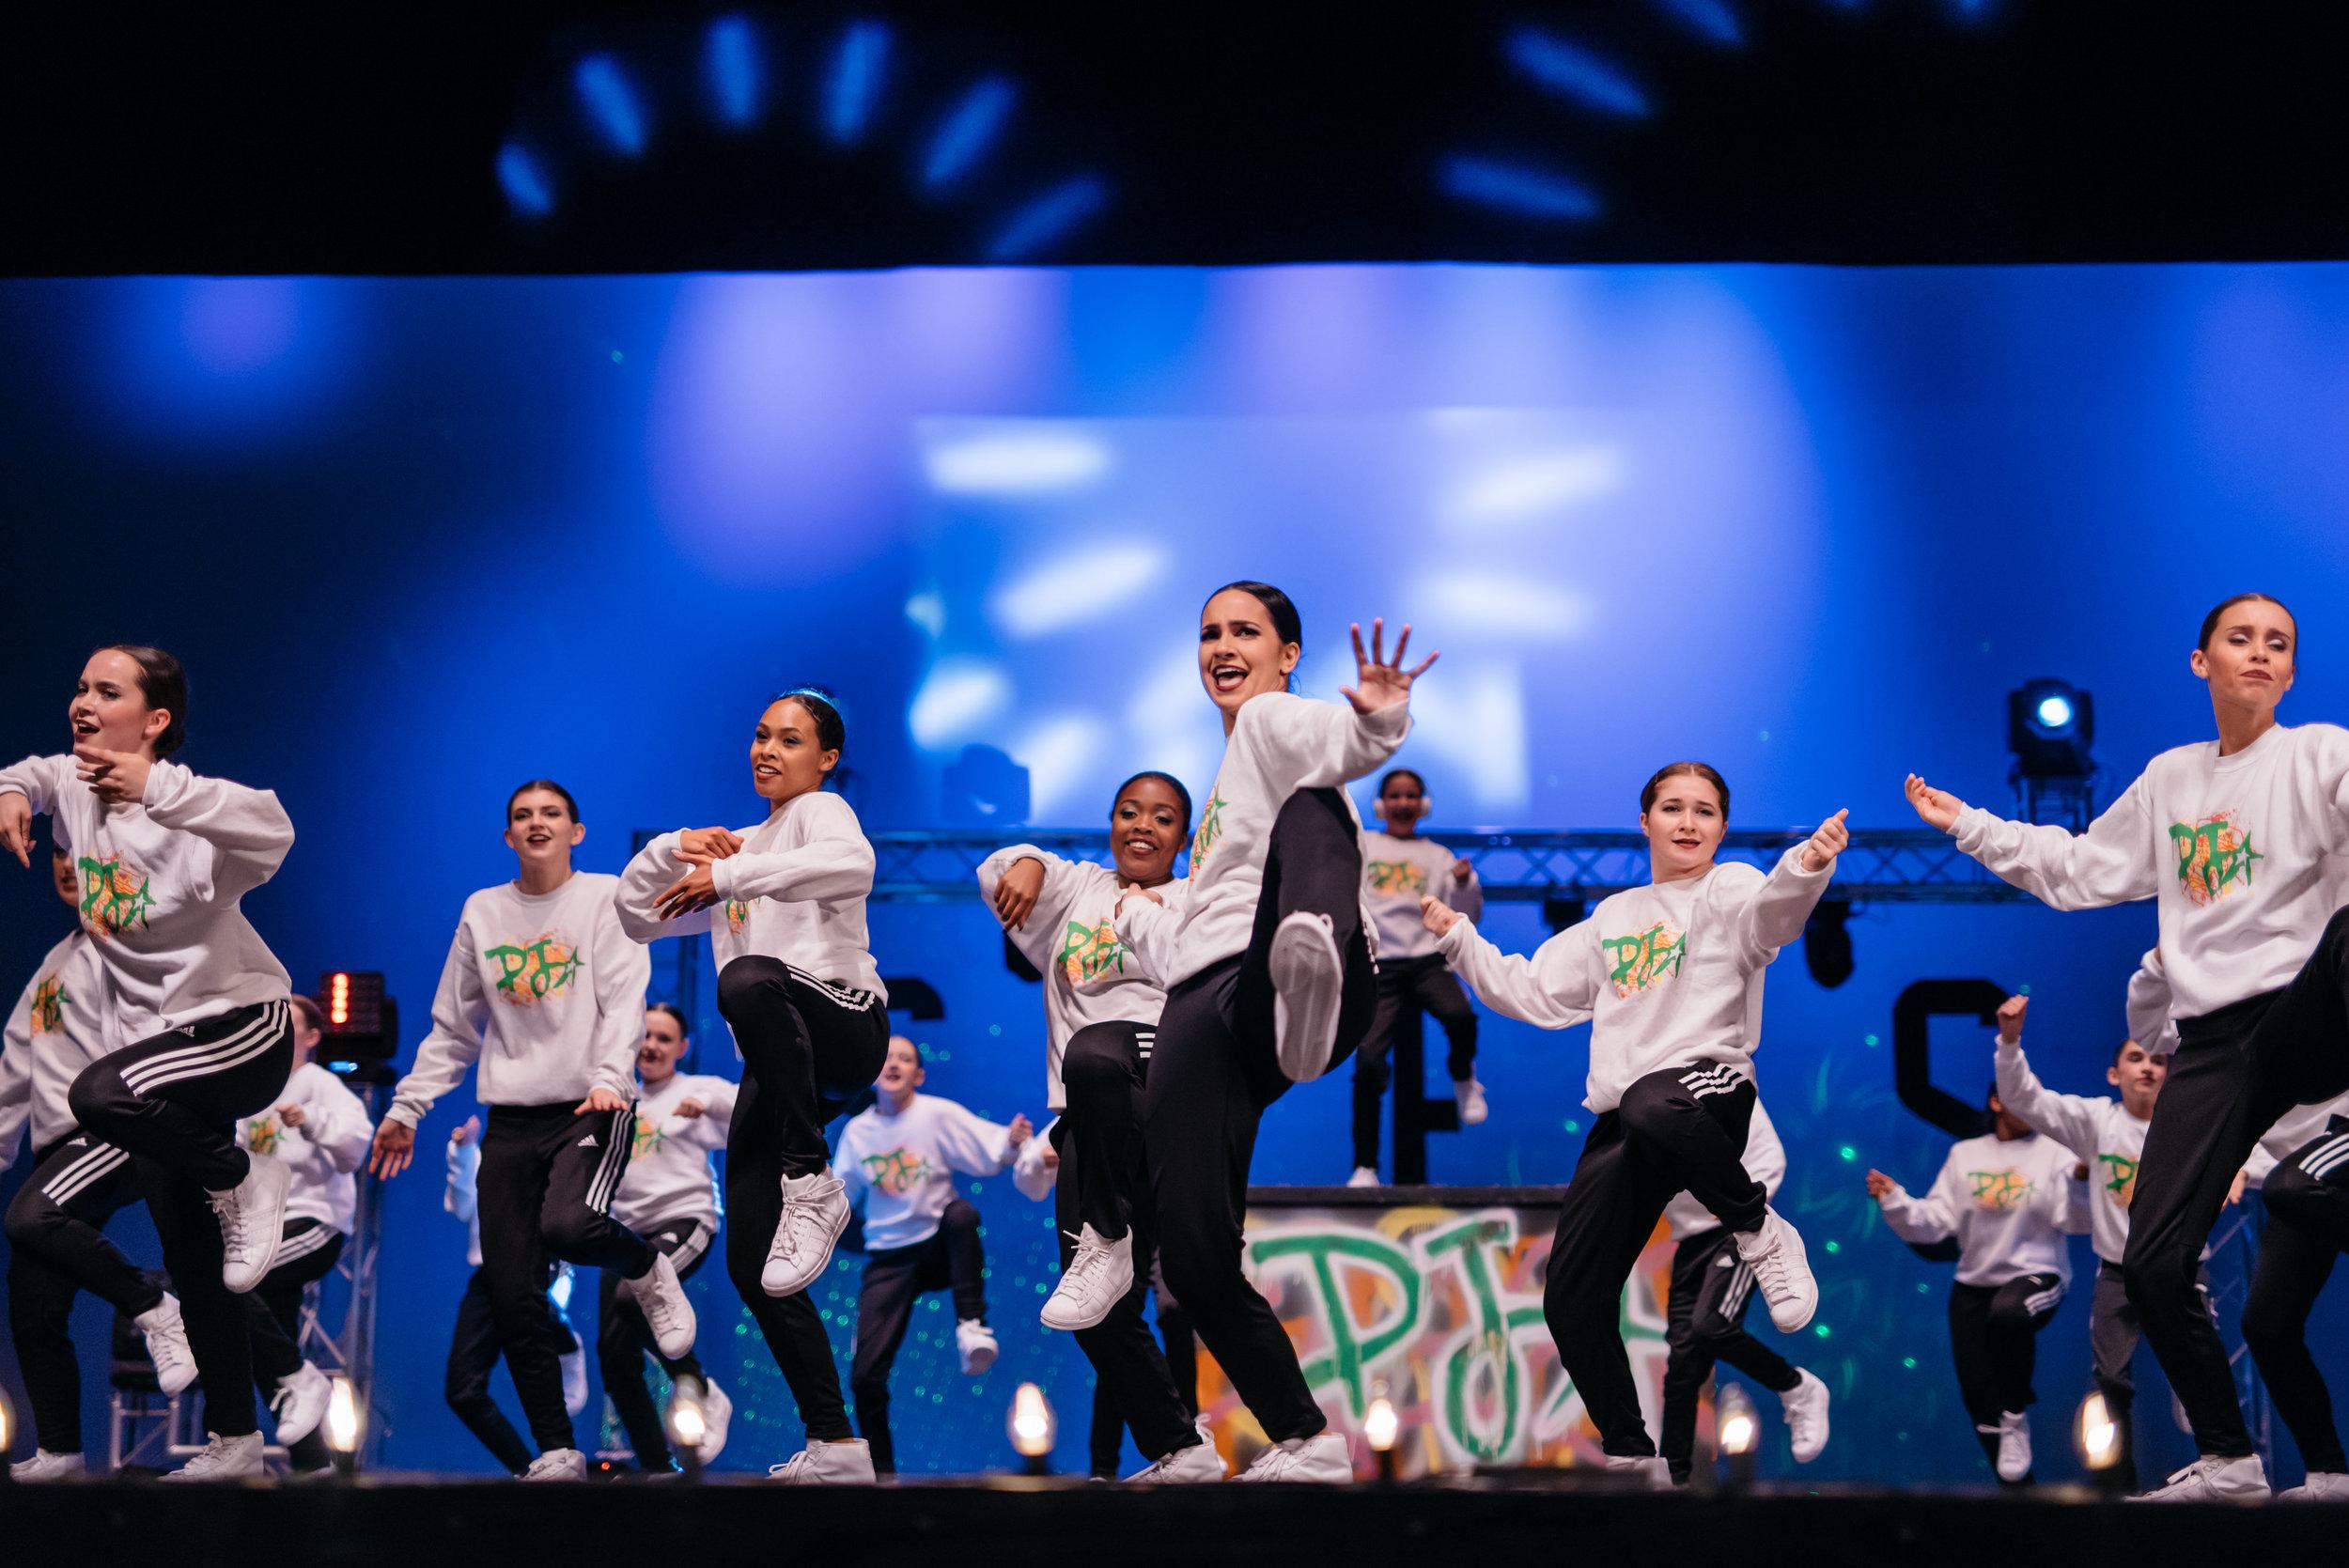 Steps N Concert Steps N Motion Dance Recital 2018-Saturday Show 2-0125.jpg